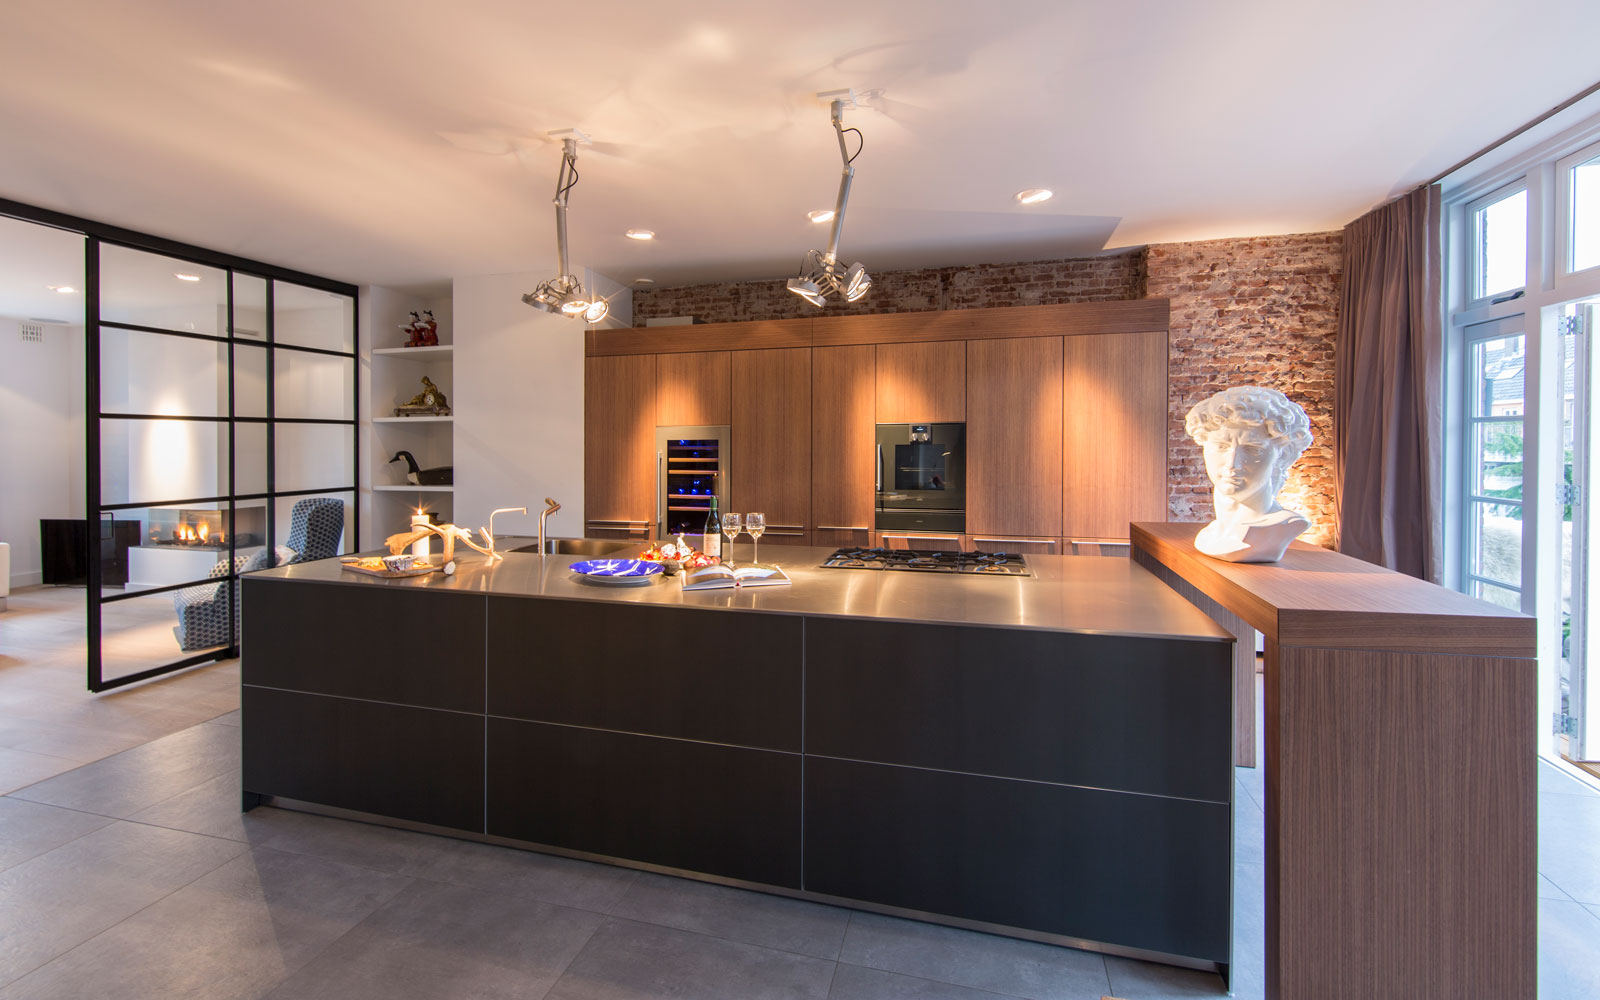 Ruime keuken, leefkeuken, Bulthaup, kastenwand, verrassende renovatie, Denoldervleugels